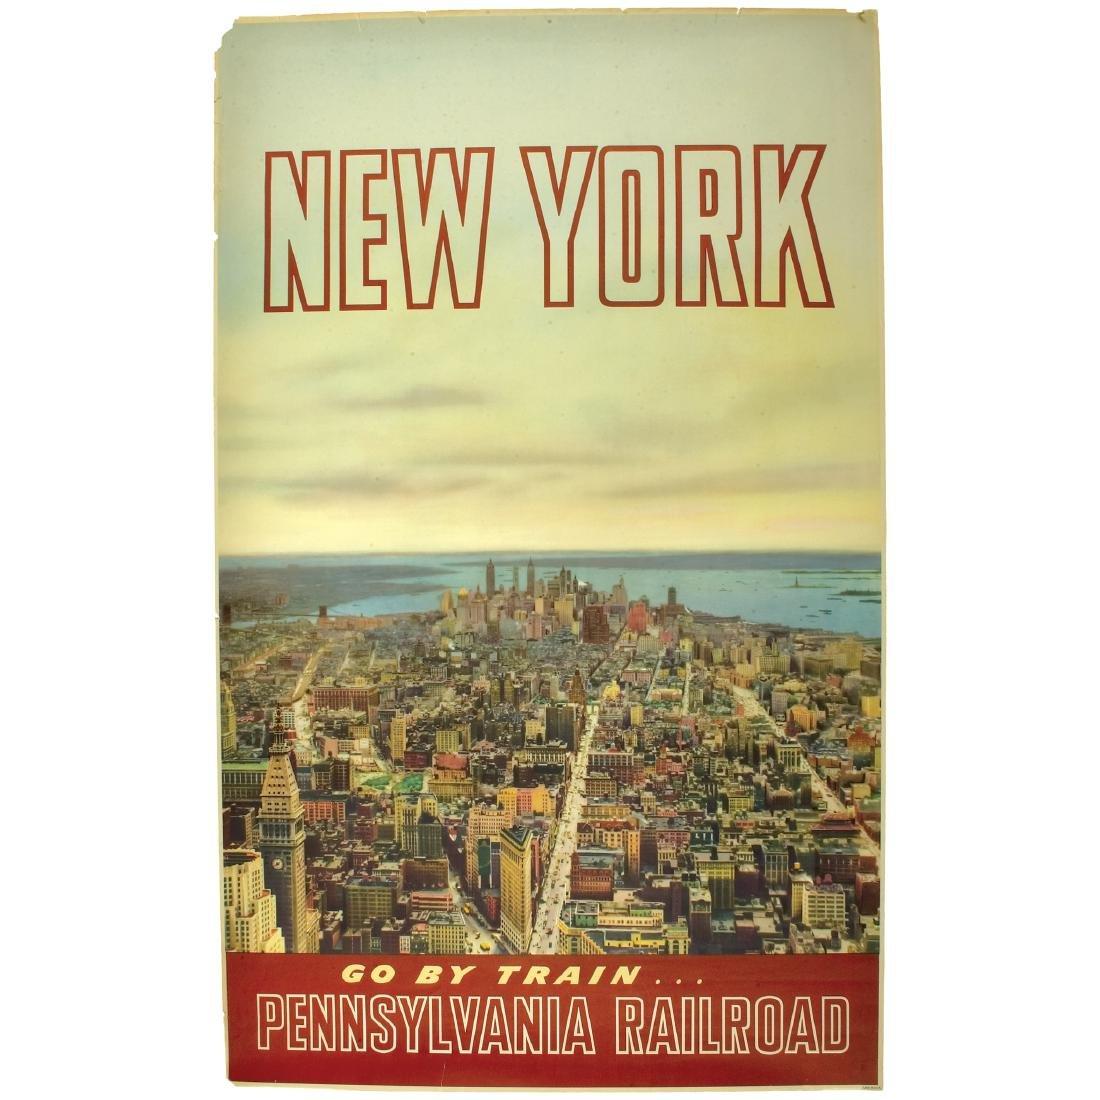 c. 1960 NEW YORK, Pennsylvania Railroad Poster